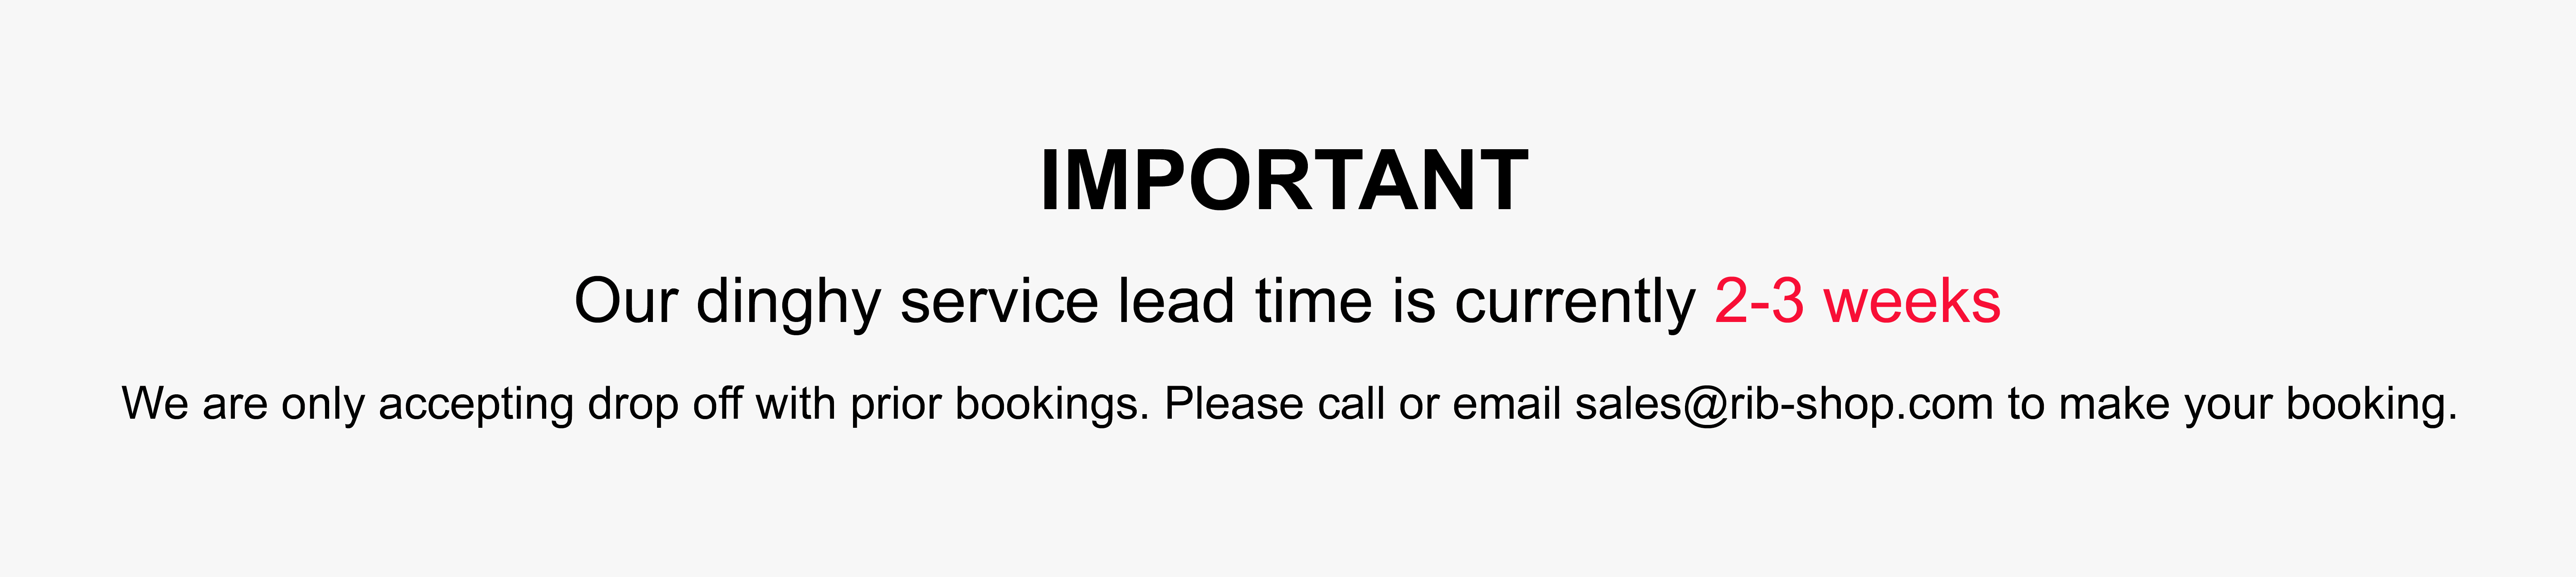 dinghy-lead-time-notice.jpg